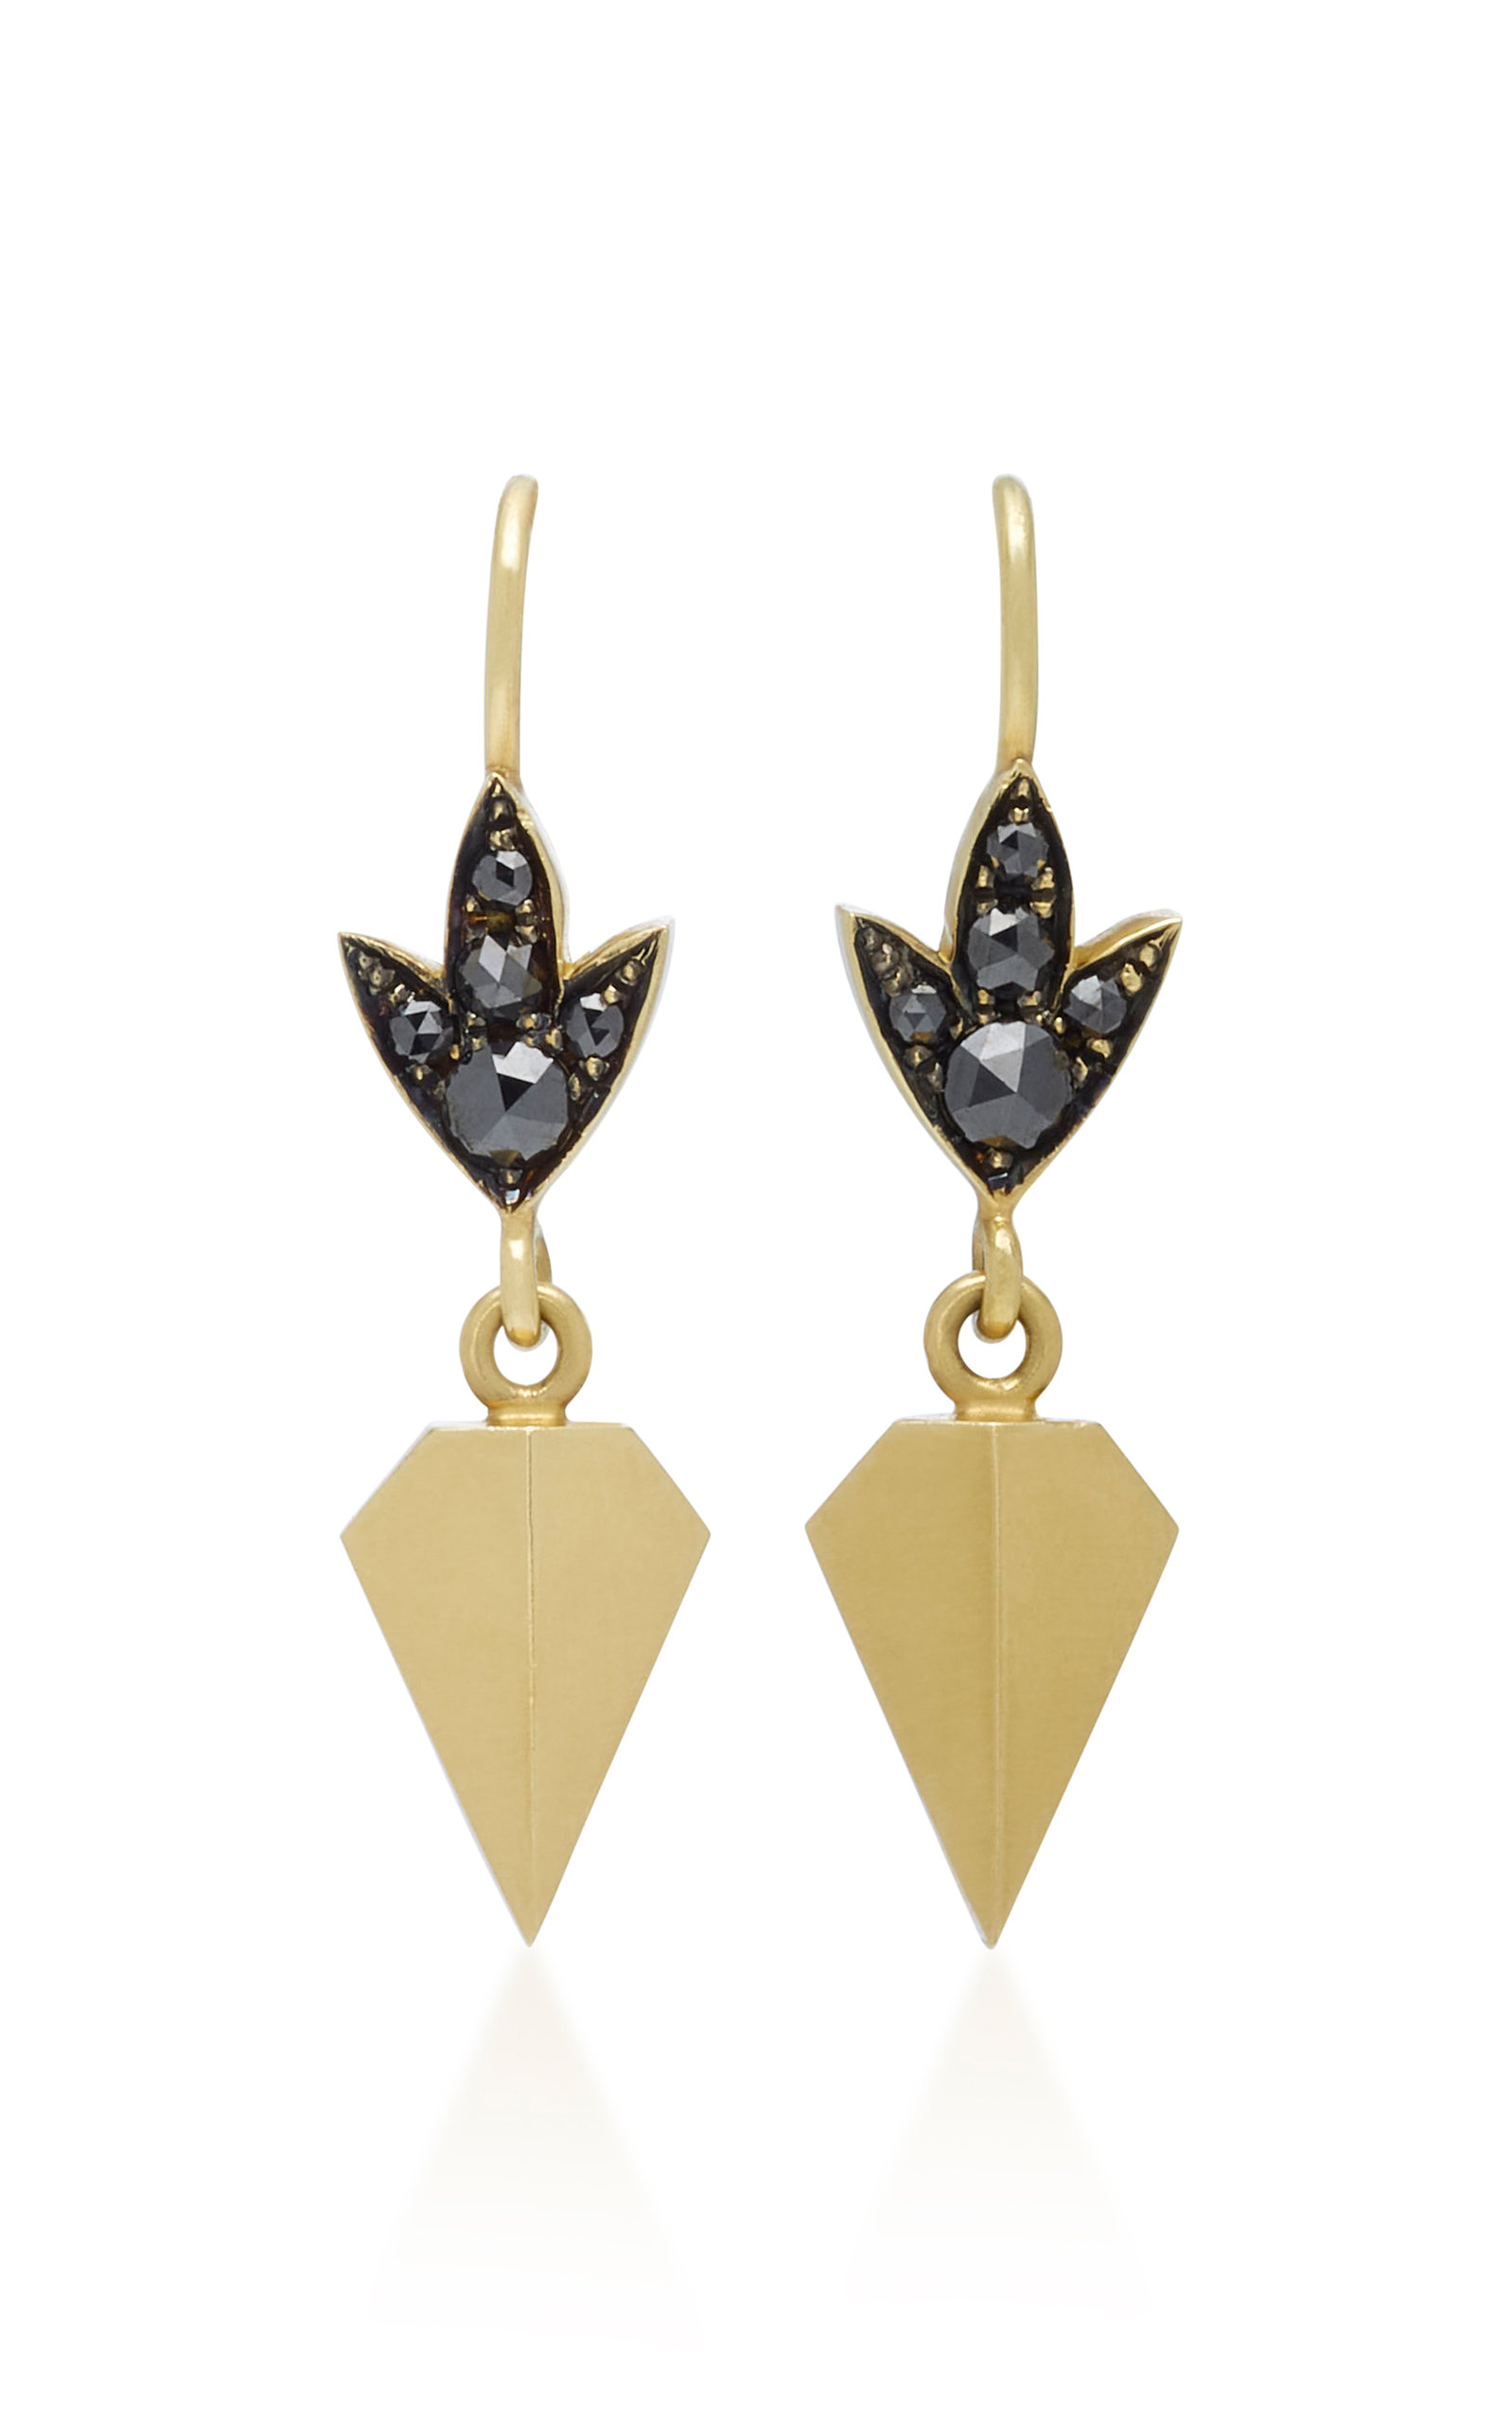 SYLVA & CIE 18K GOLD BLACK DIAMOND EARRINGS